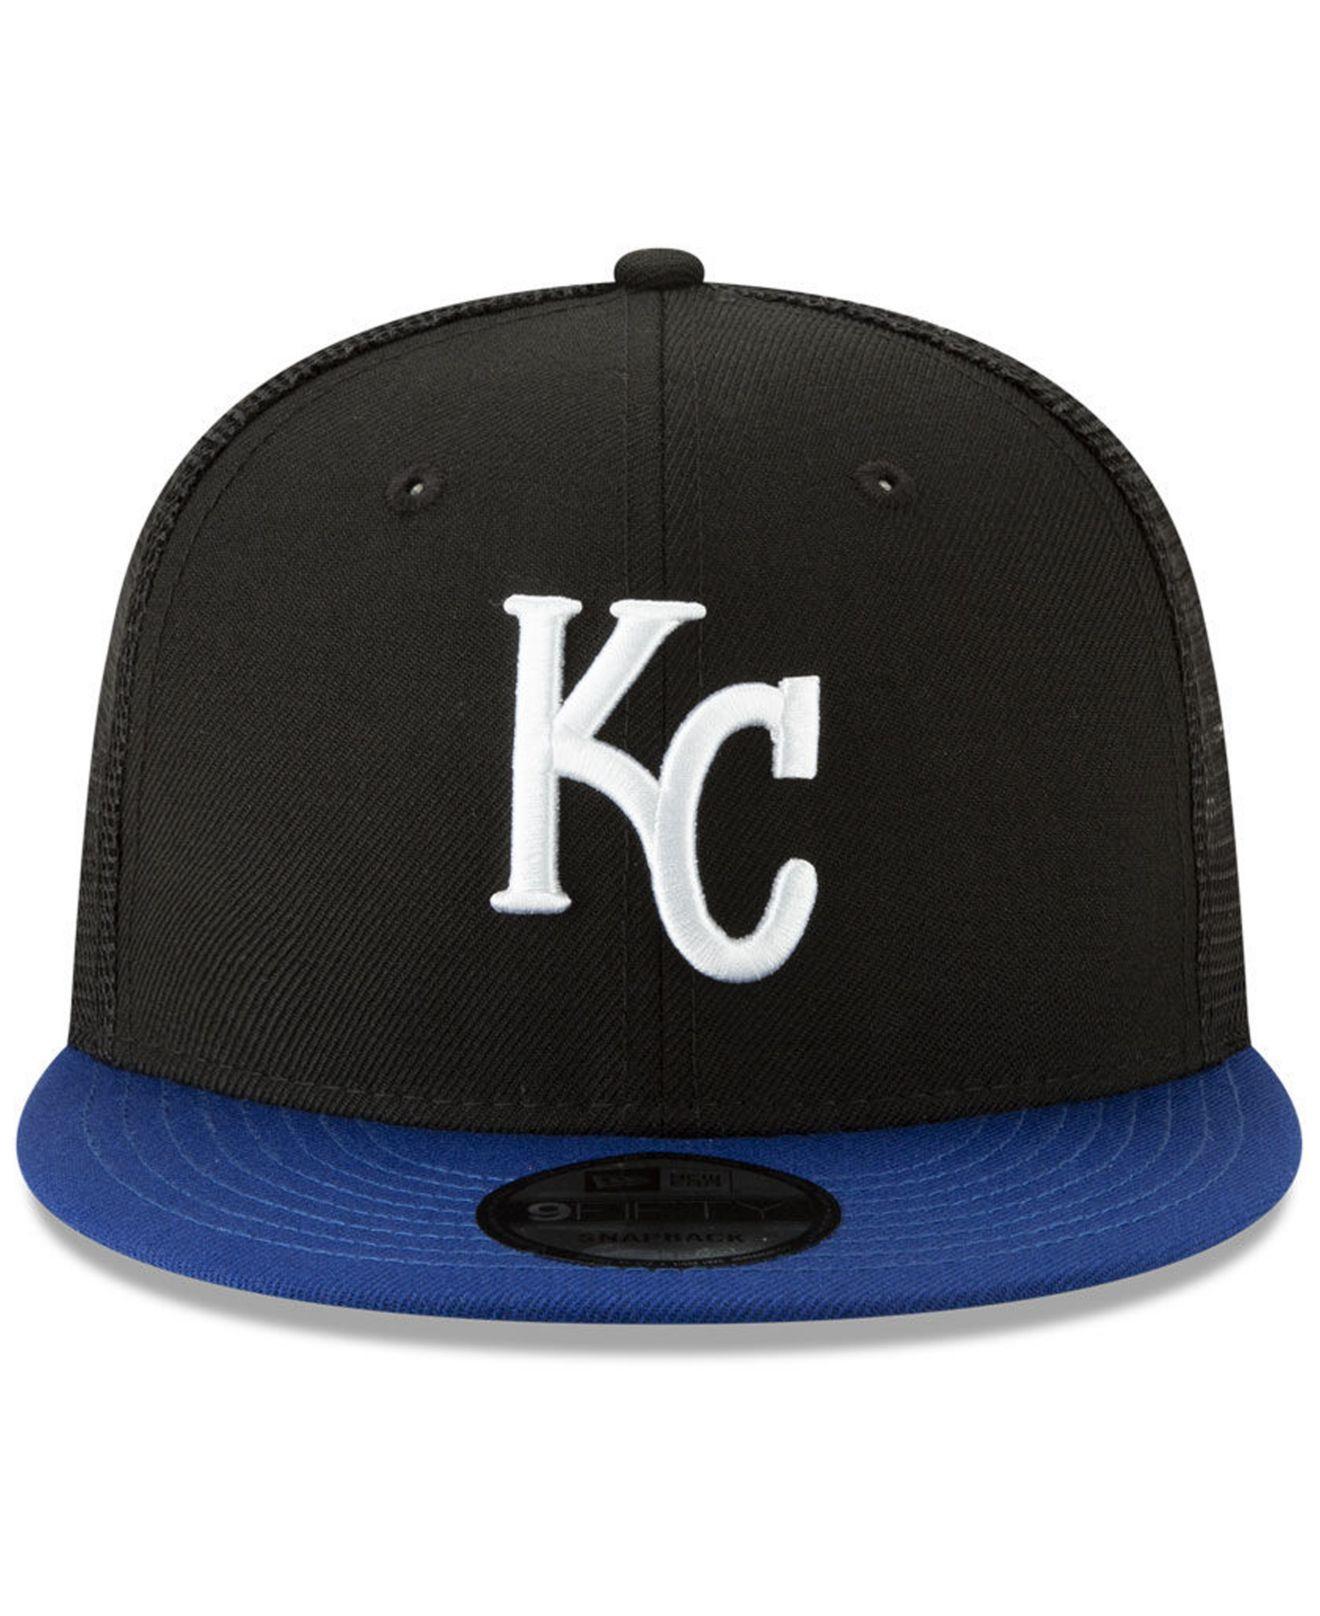 san francisco a87c4 68b3e Lyst - KTZ Kansas City Royals Coop All Day Mesh Back 9fifty Snapback Cap in  Black for Men